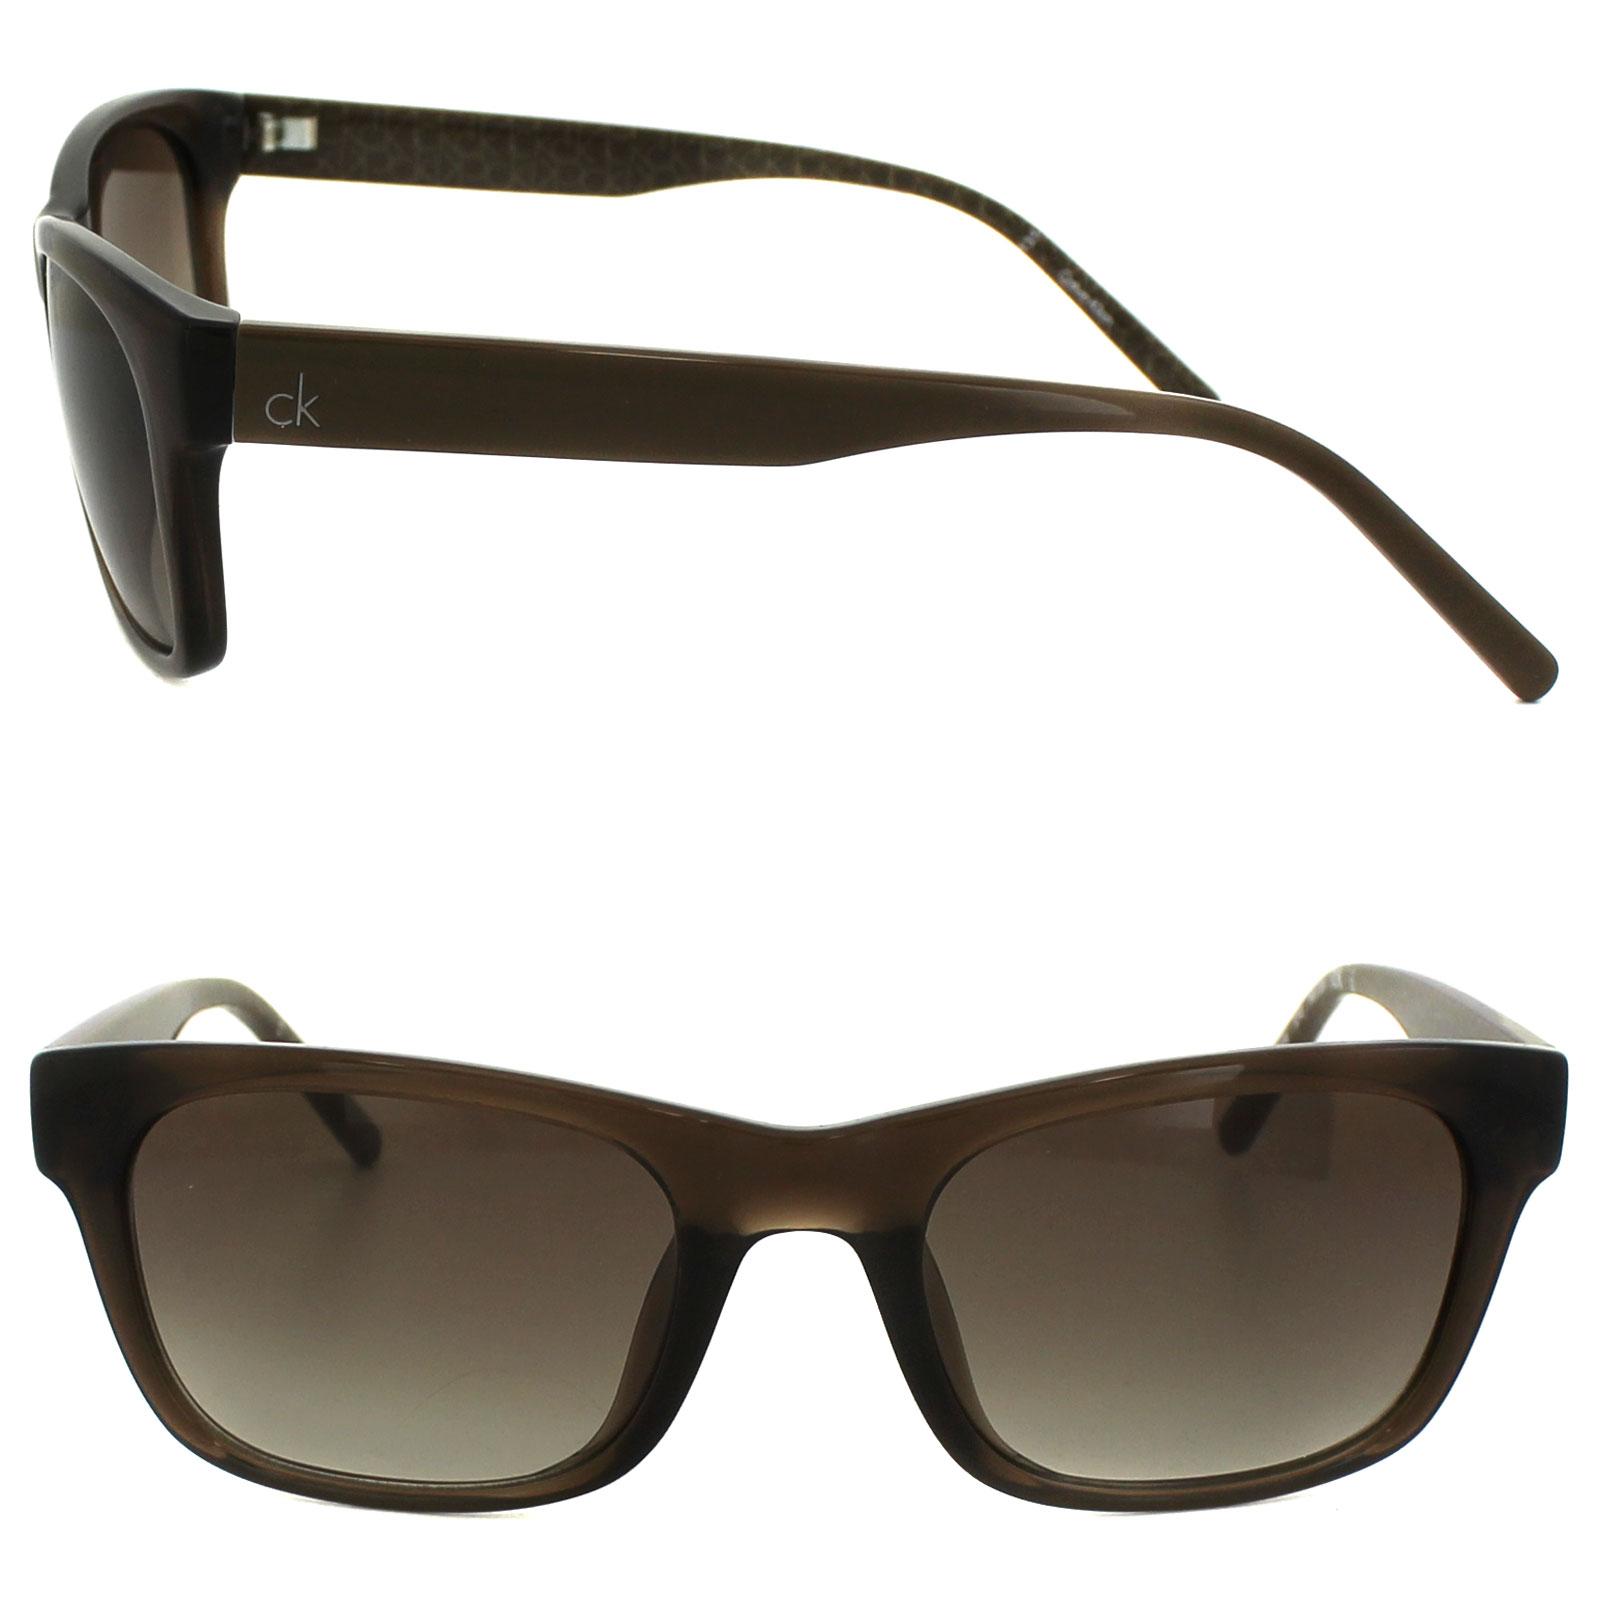 Cheap Calvin Klein 3140 Sunglasses Discounted Sunglasses